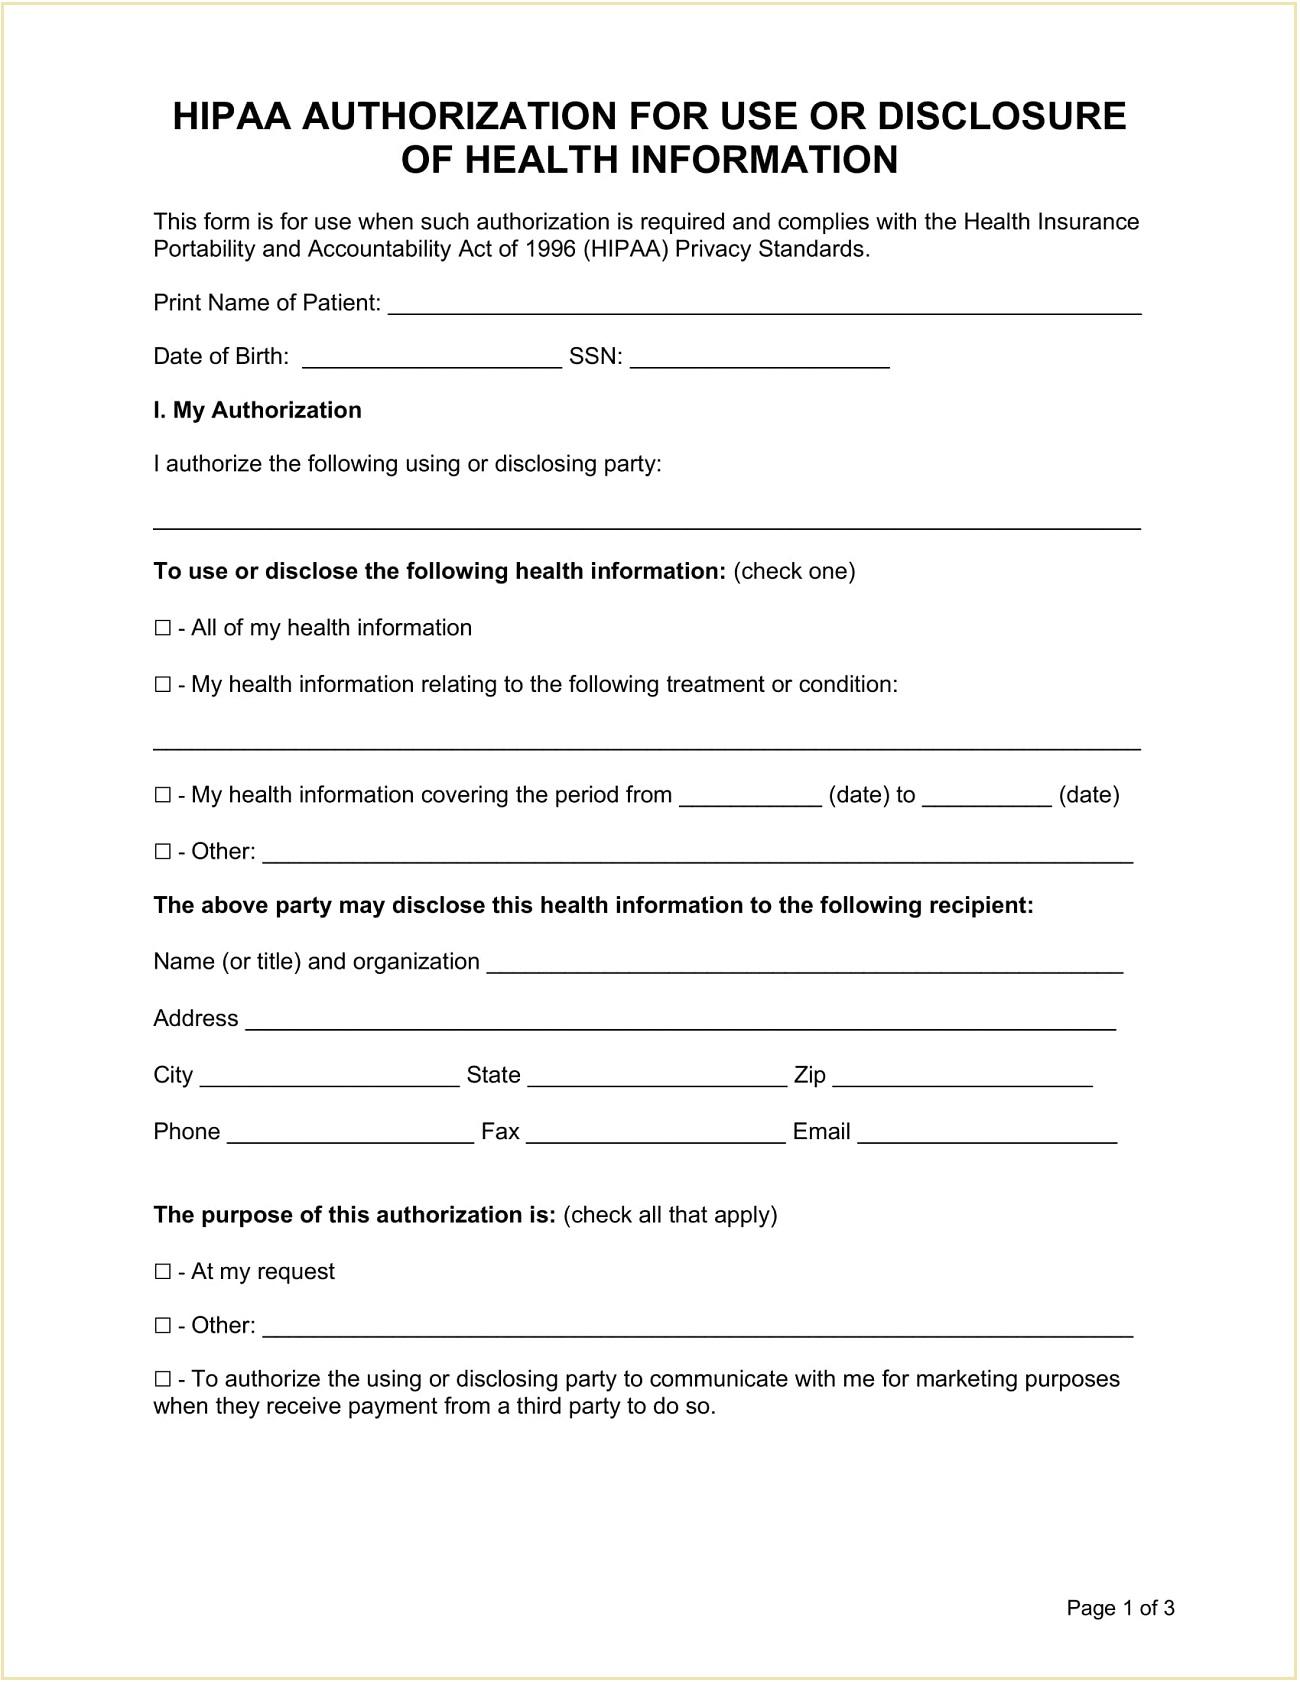 HIPAA Authorization Form Template Word